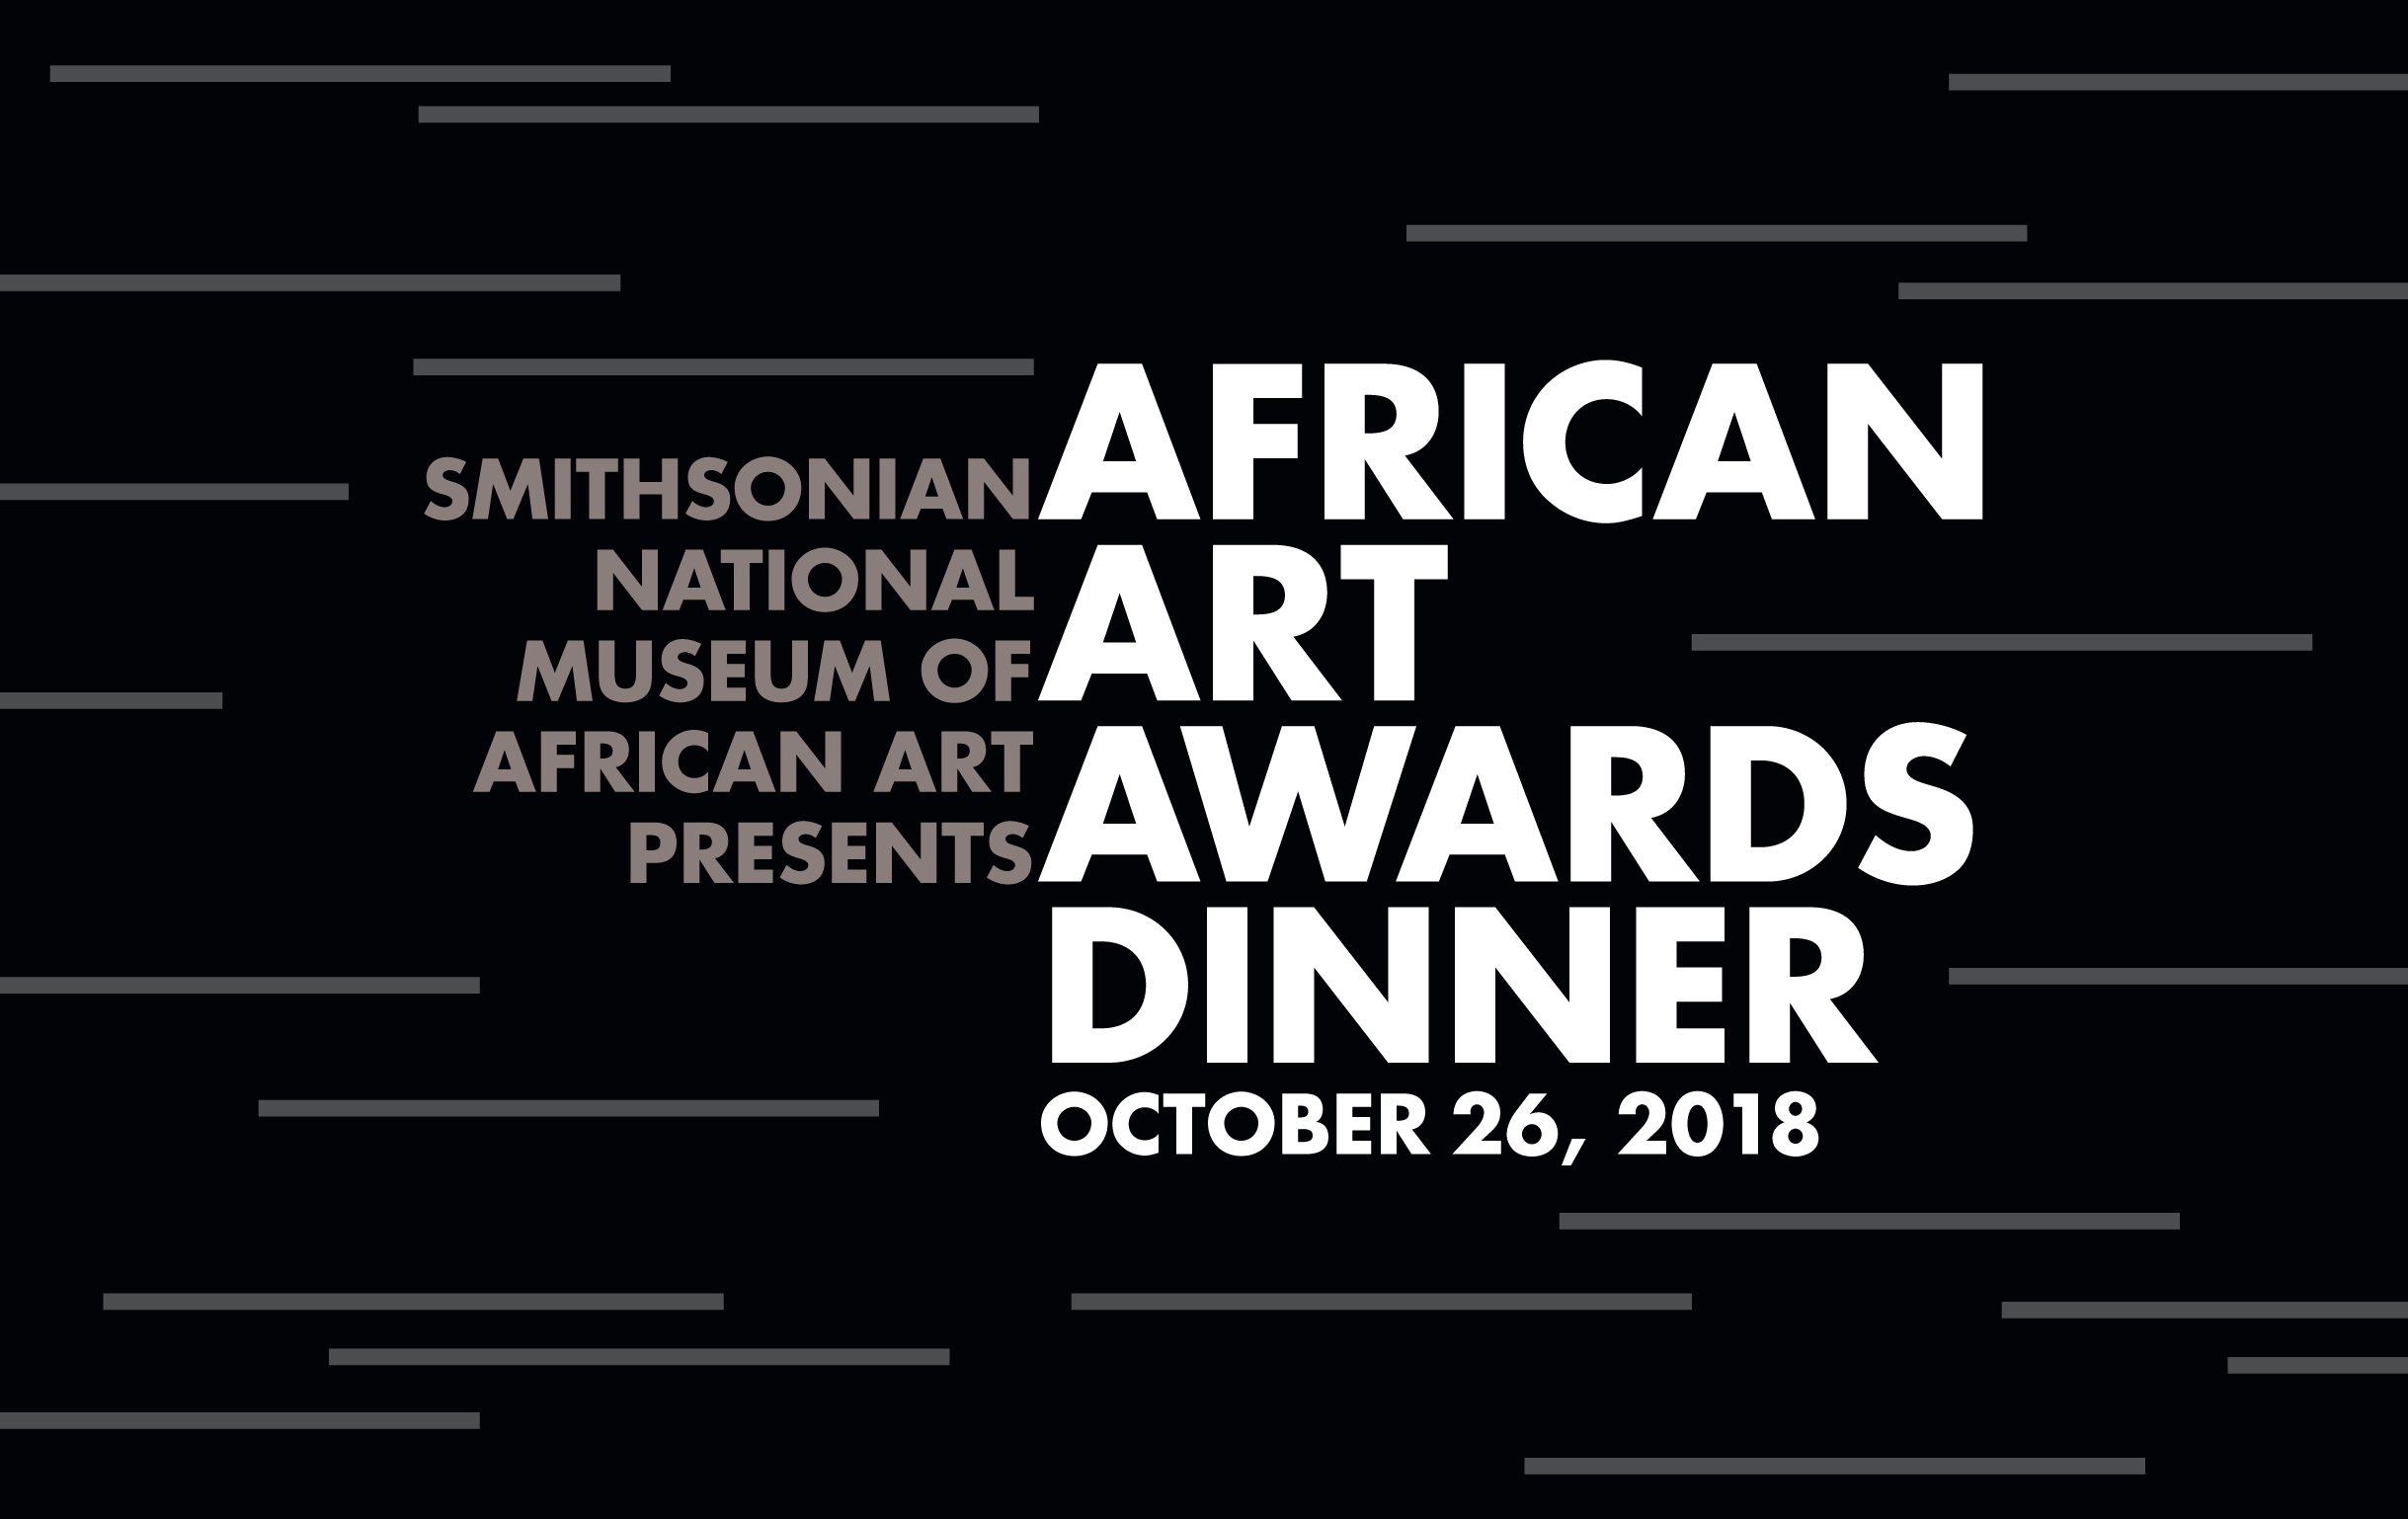 2018 African Arts Awards Dinner